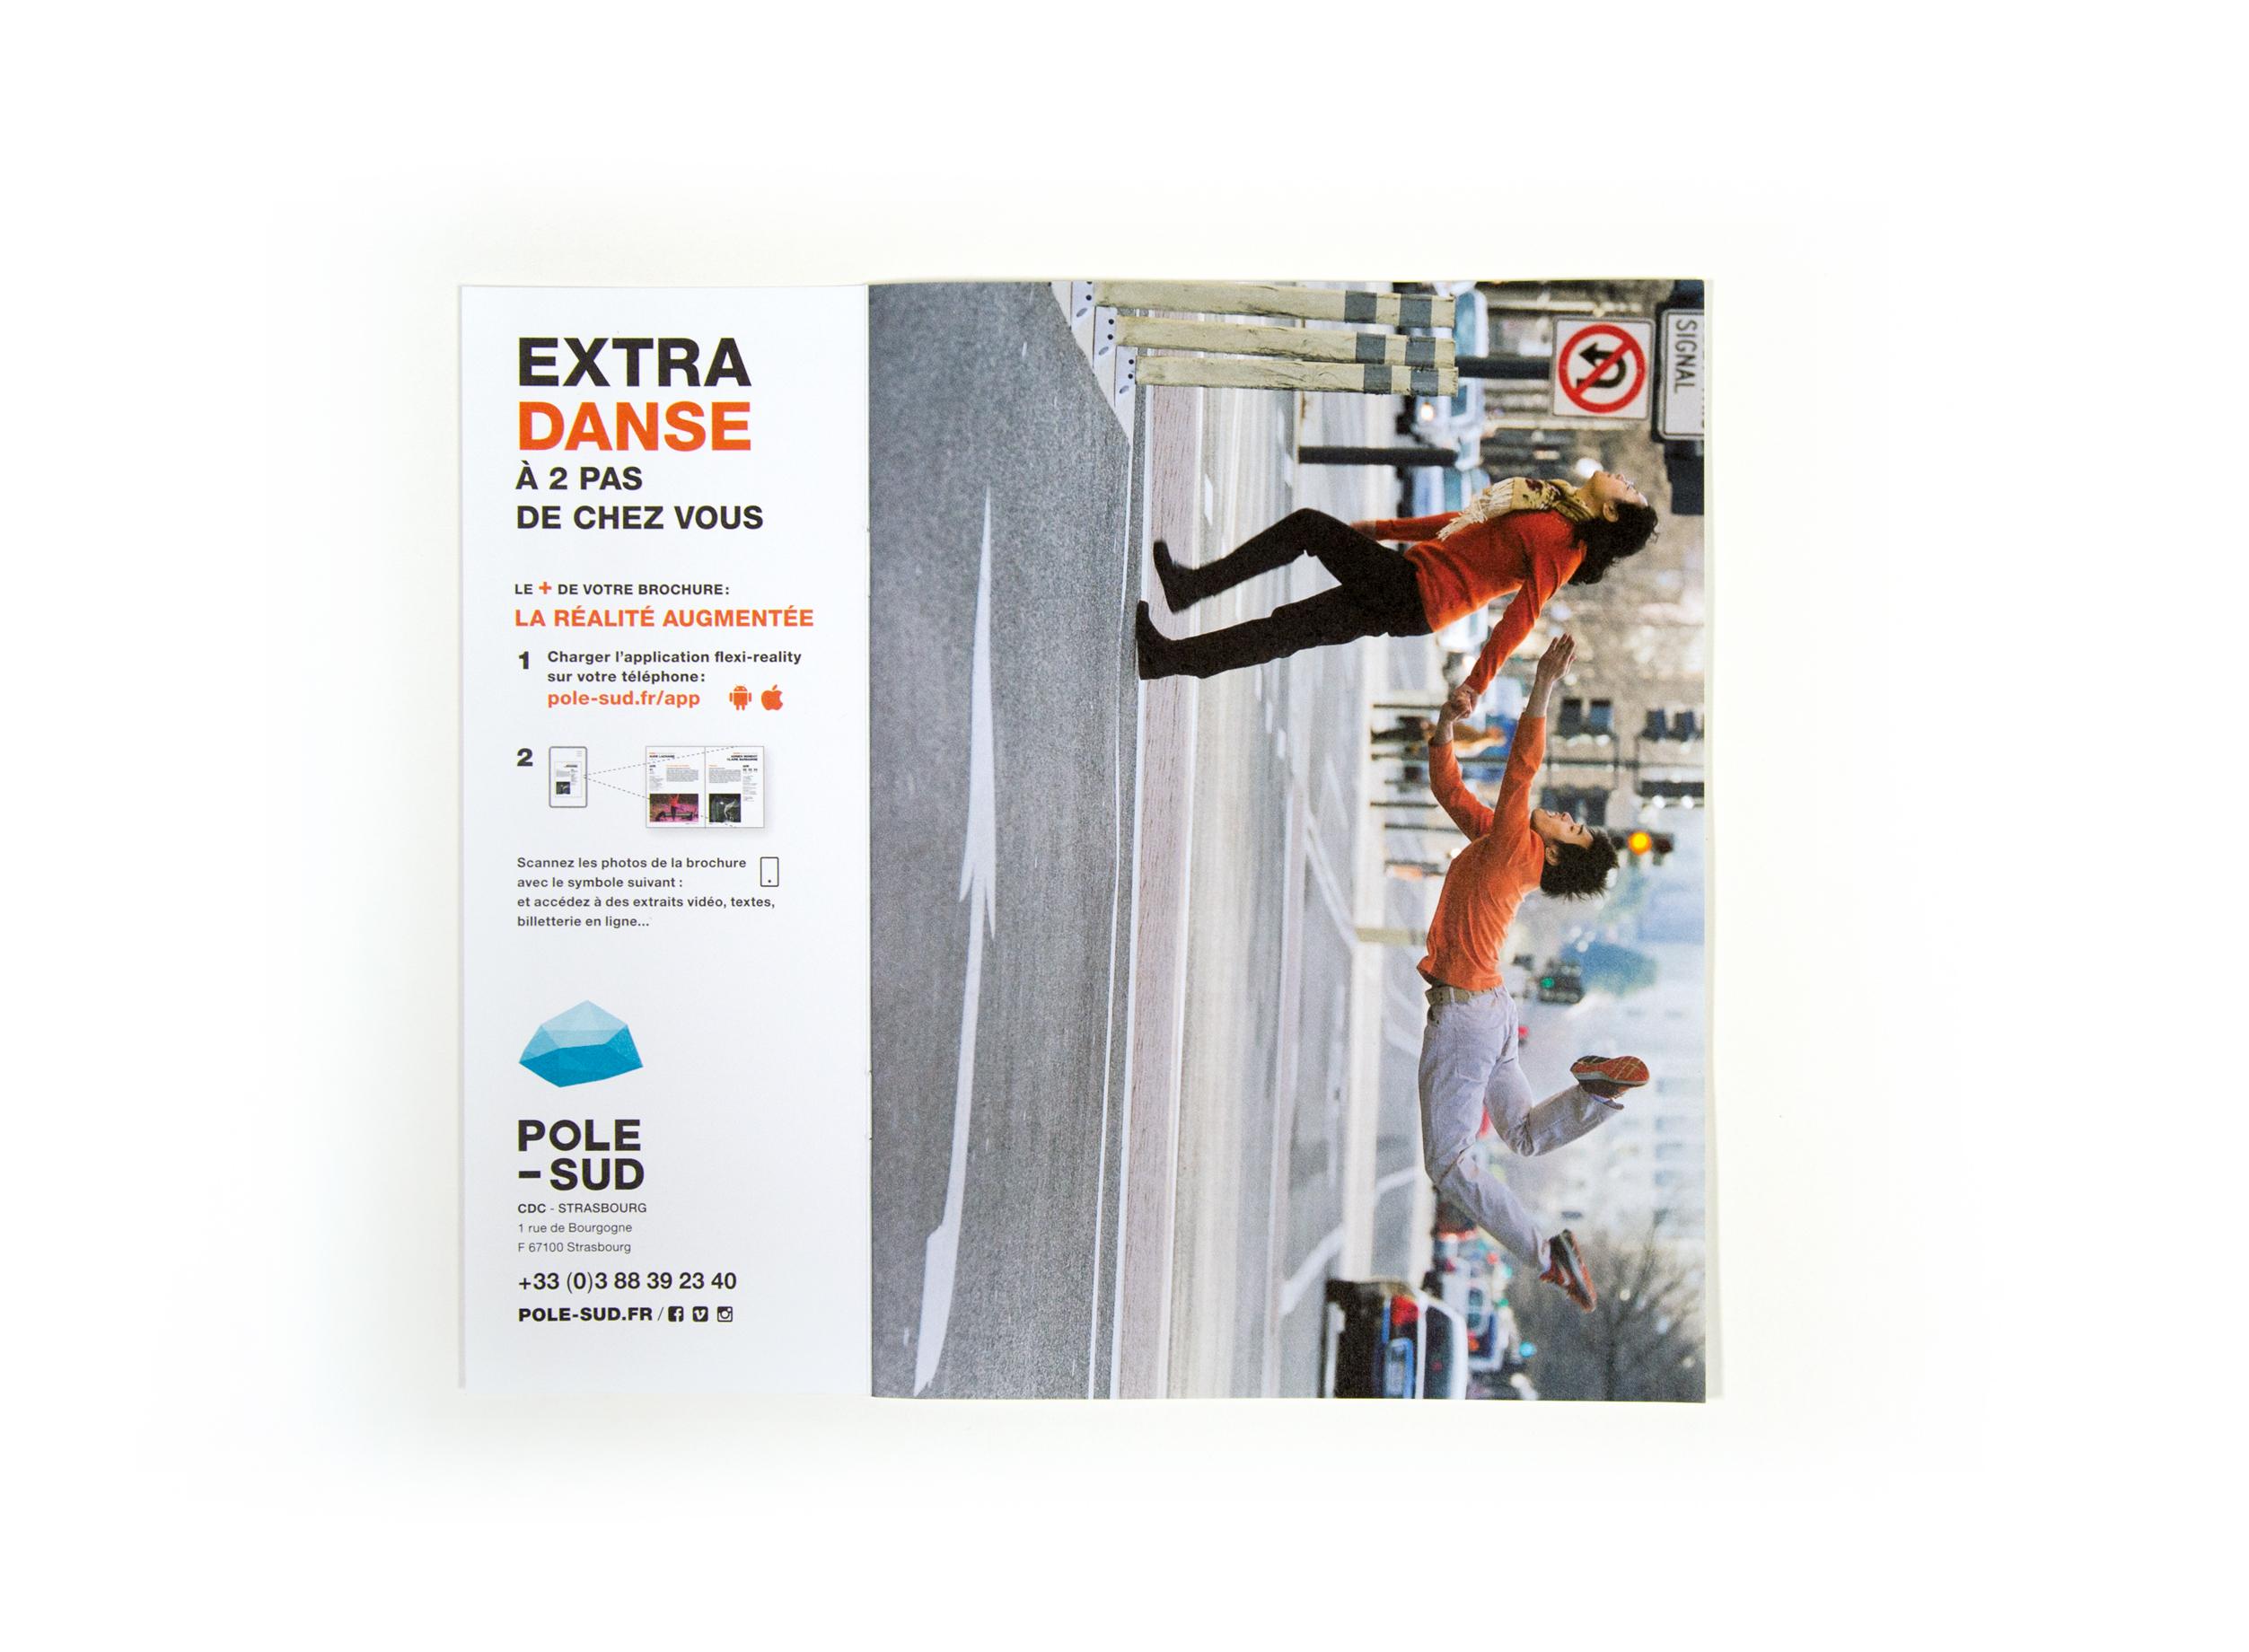 15 16 EXTRADANSE Brochure 02